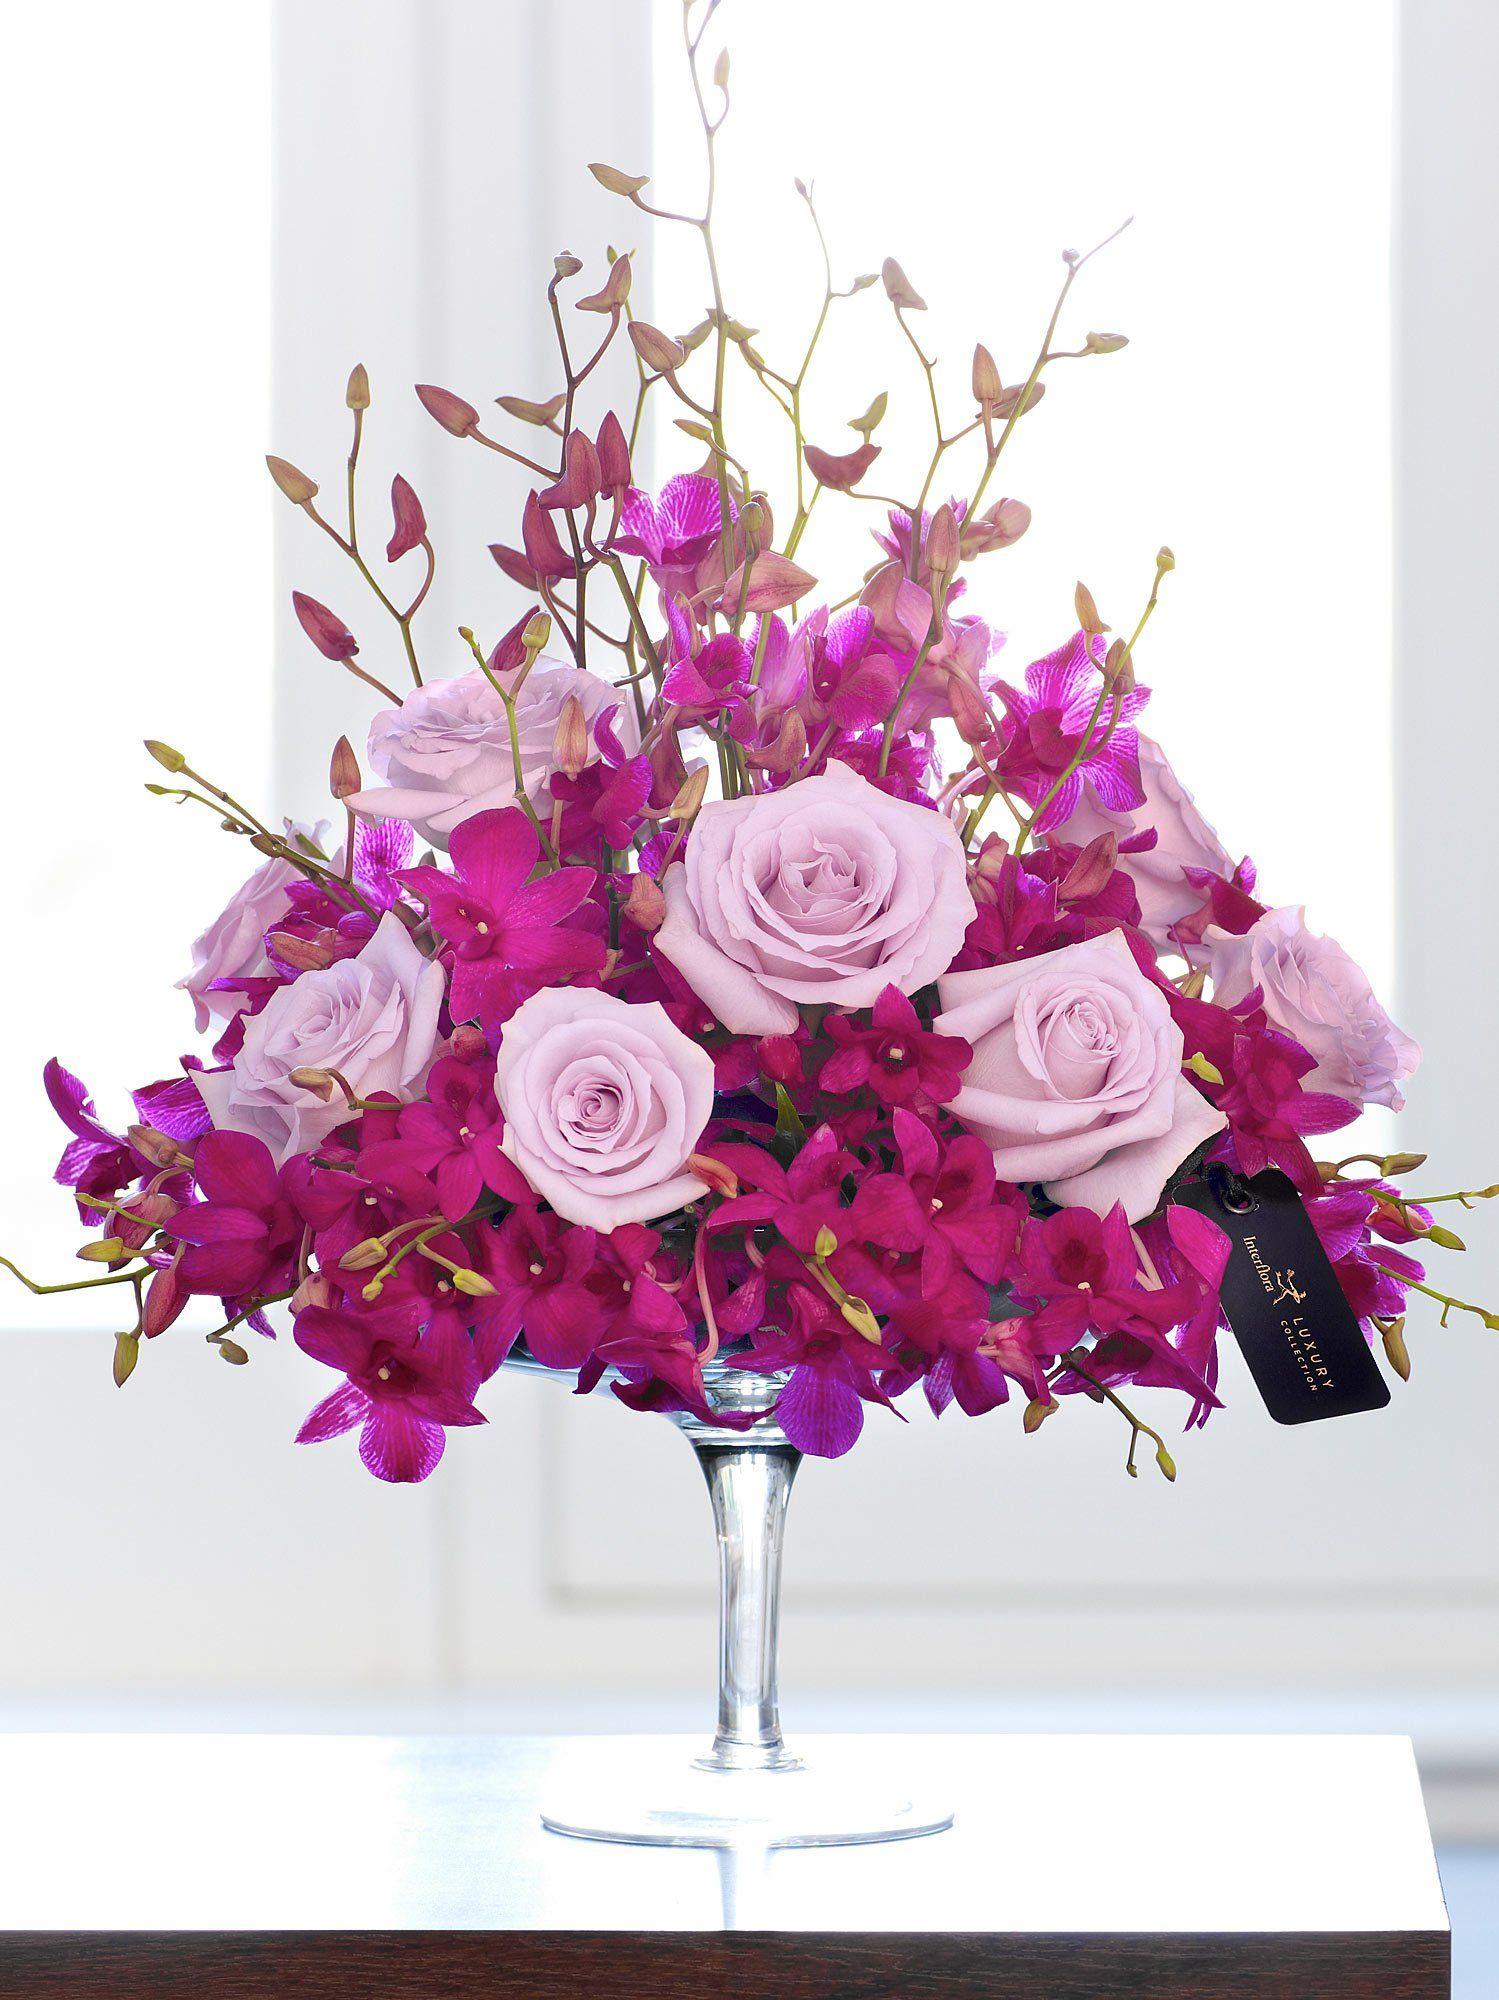 Luxury Orchid and Rose Arrangement Interflora Bouquet